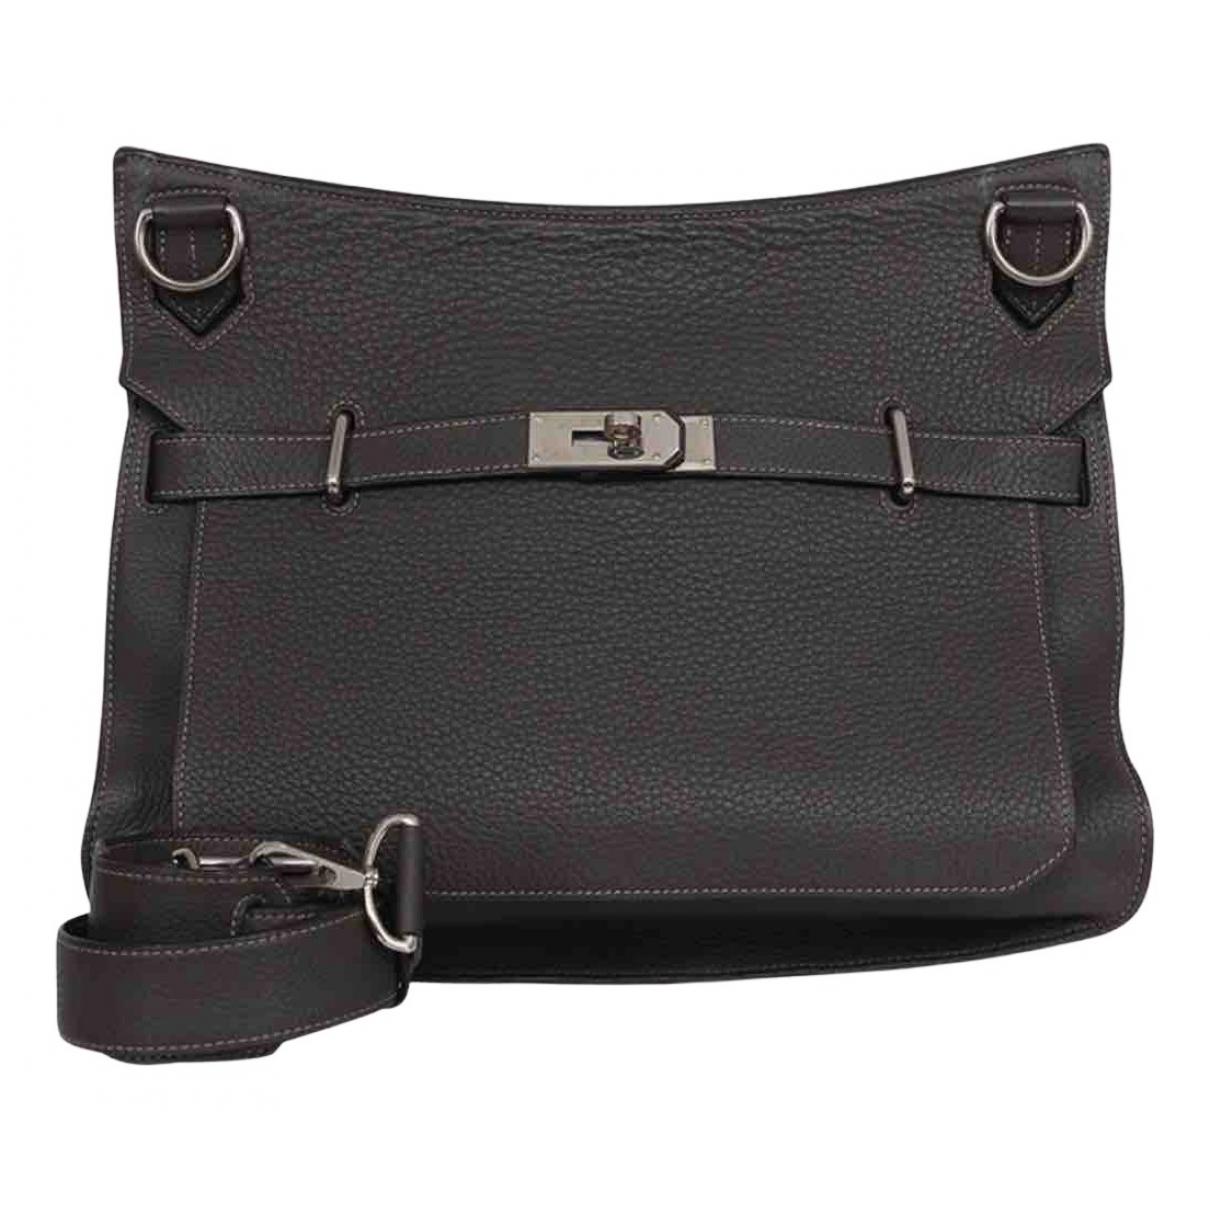 Hermès Jypsiere Black Leather handbag for Women N